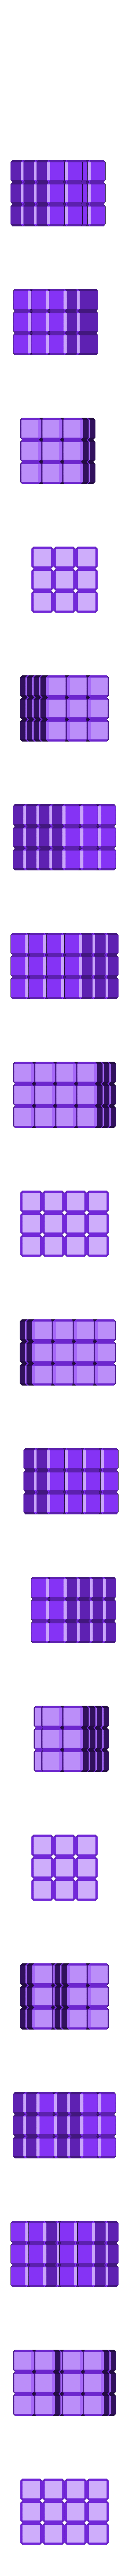 30_units.stl Download free STL file Cube Puzzle: 5 x 5 x 5, Five-Piece Dissection • 3D print model, LGBU